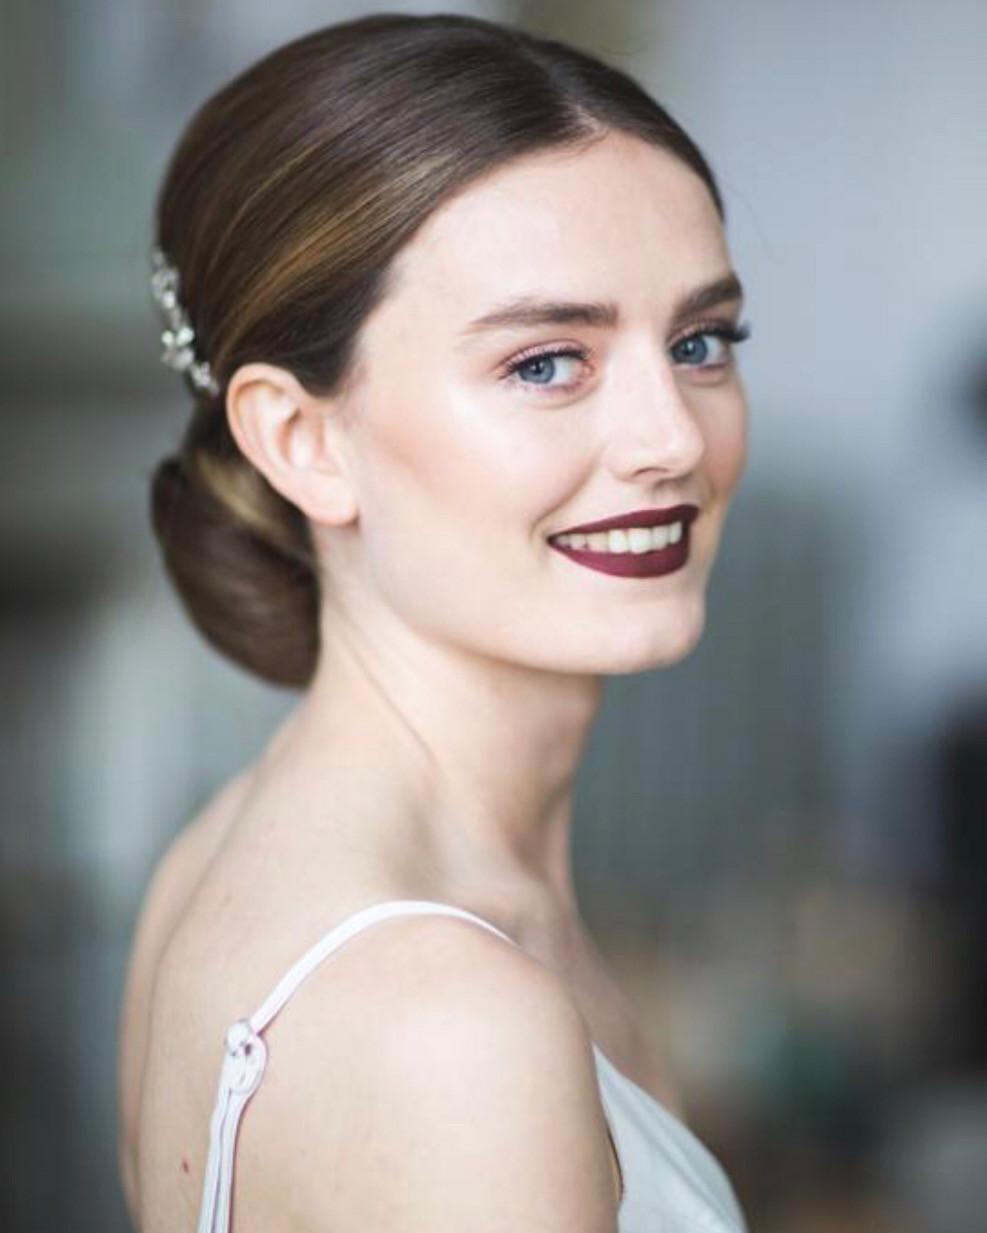 Make Up @nadiaharperbridal - Make Me Bridal Artist: Gavin Harvie Hair. Photography by: Rebecca Campbell Photography. #classic #vintage #hairup #bridalhairup #elegant #sleekupdo #elegantupdo